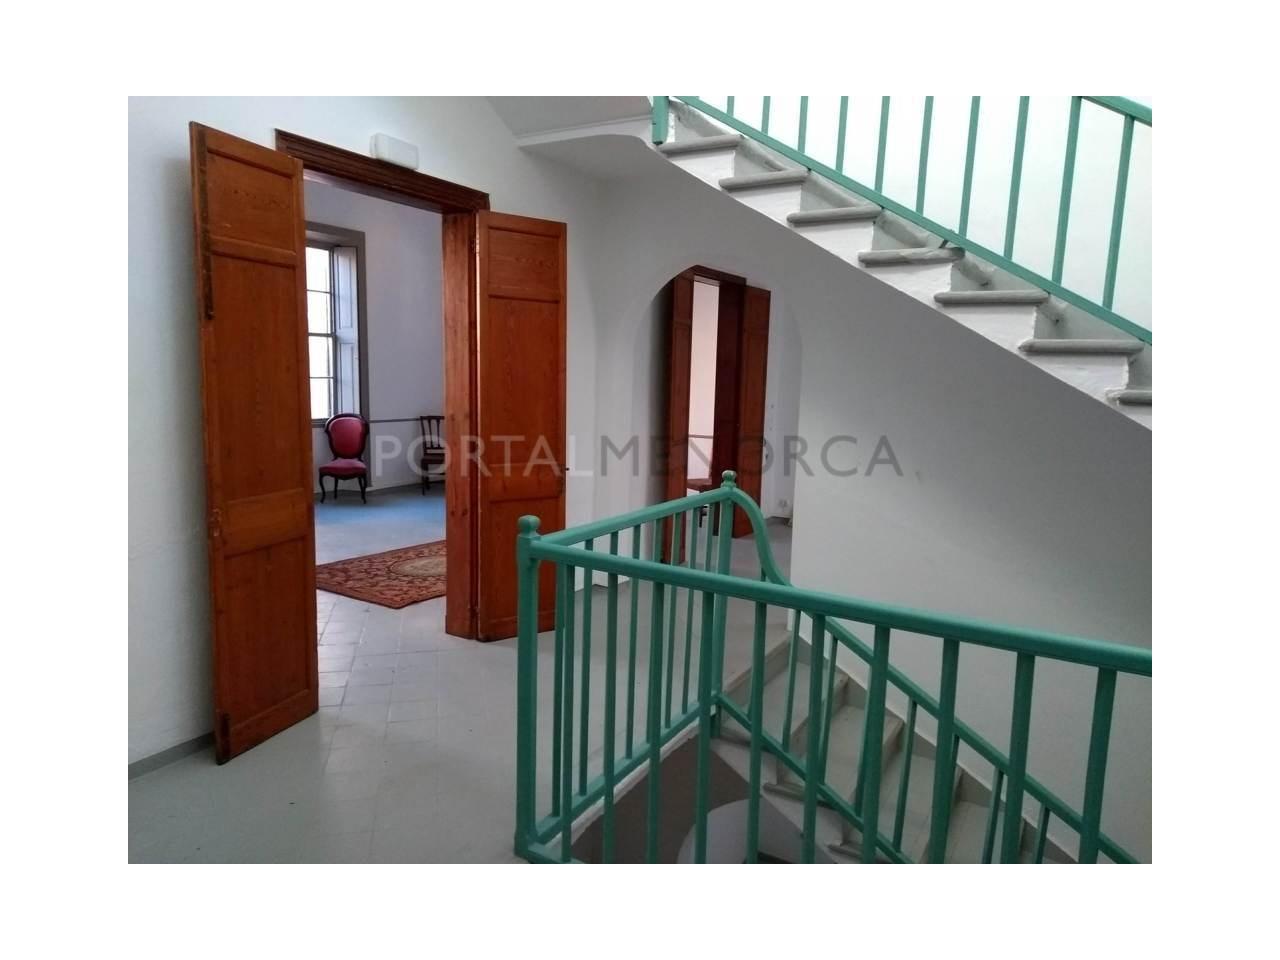 Manor house for sale in Ciutadella-frist floor